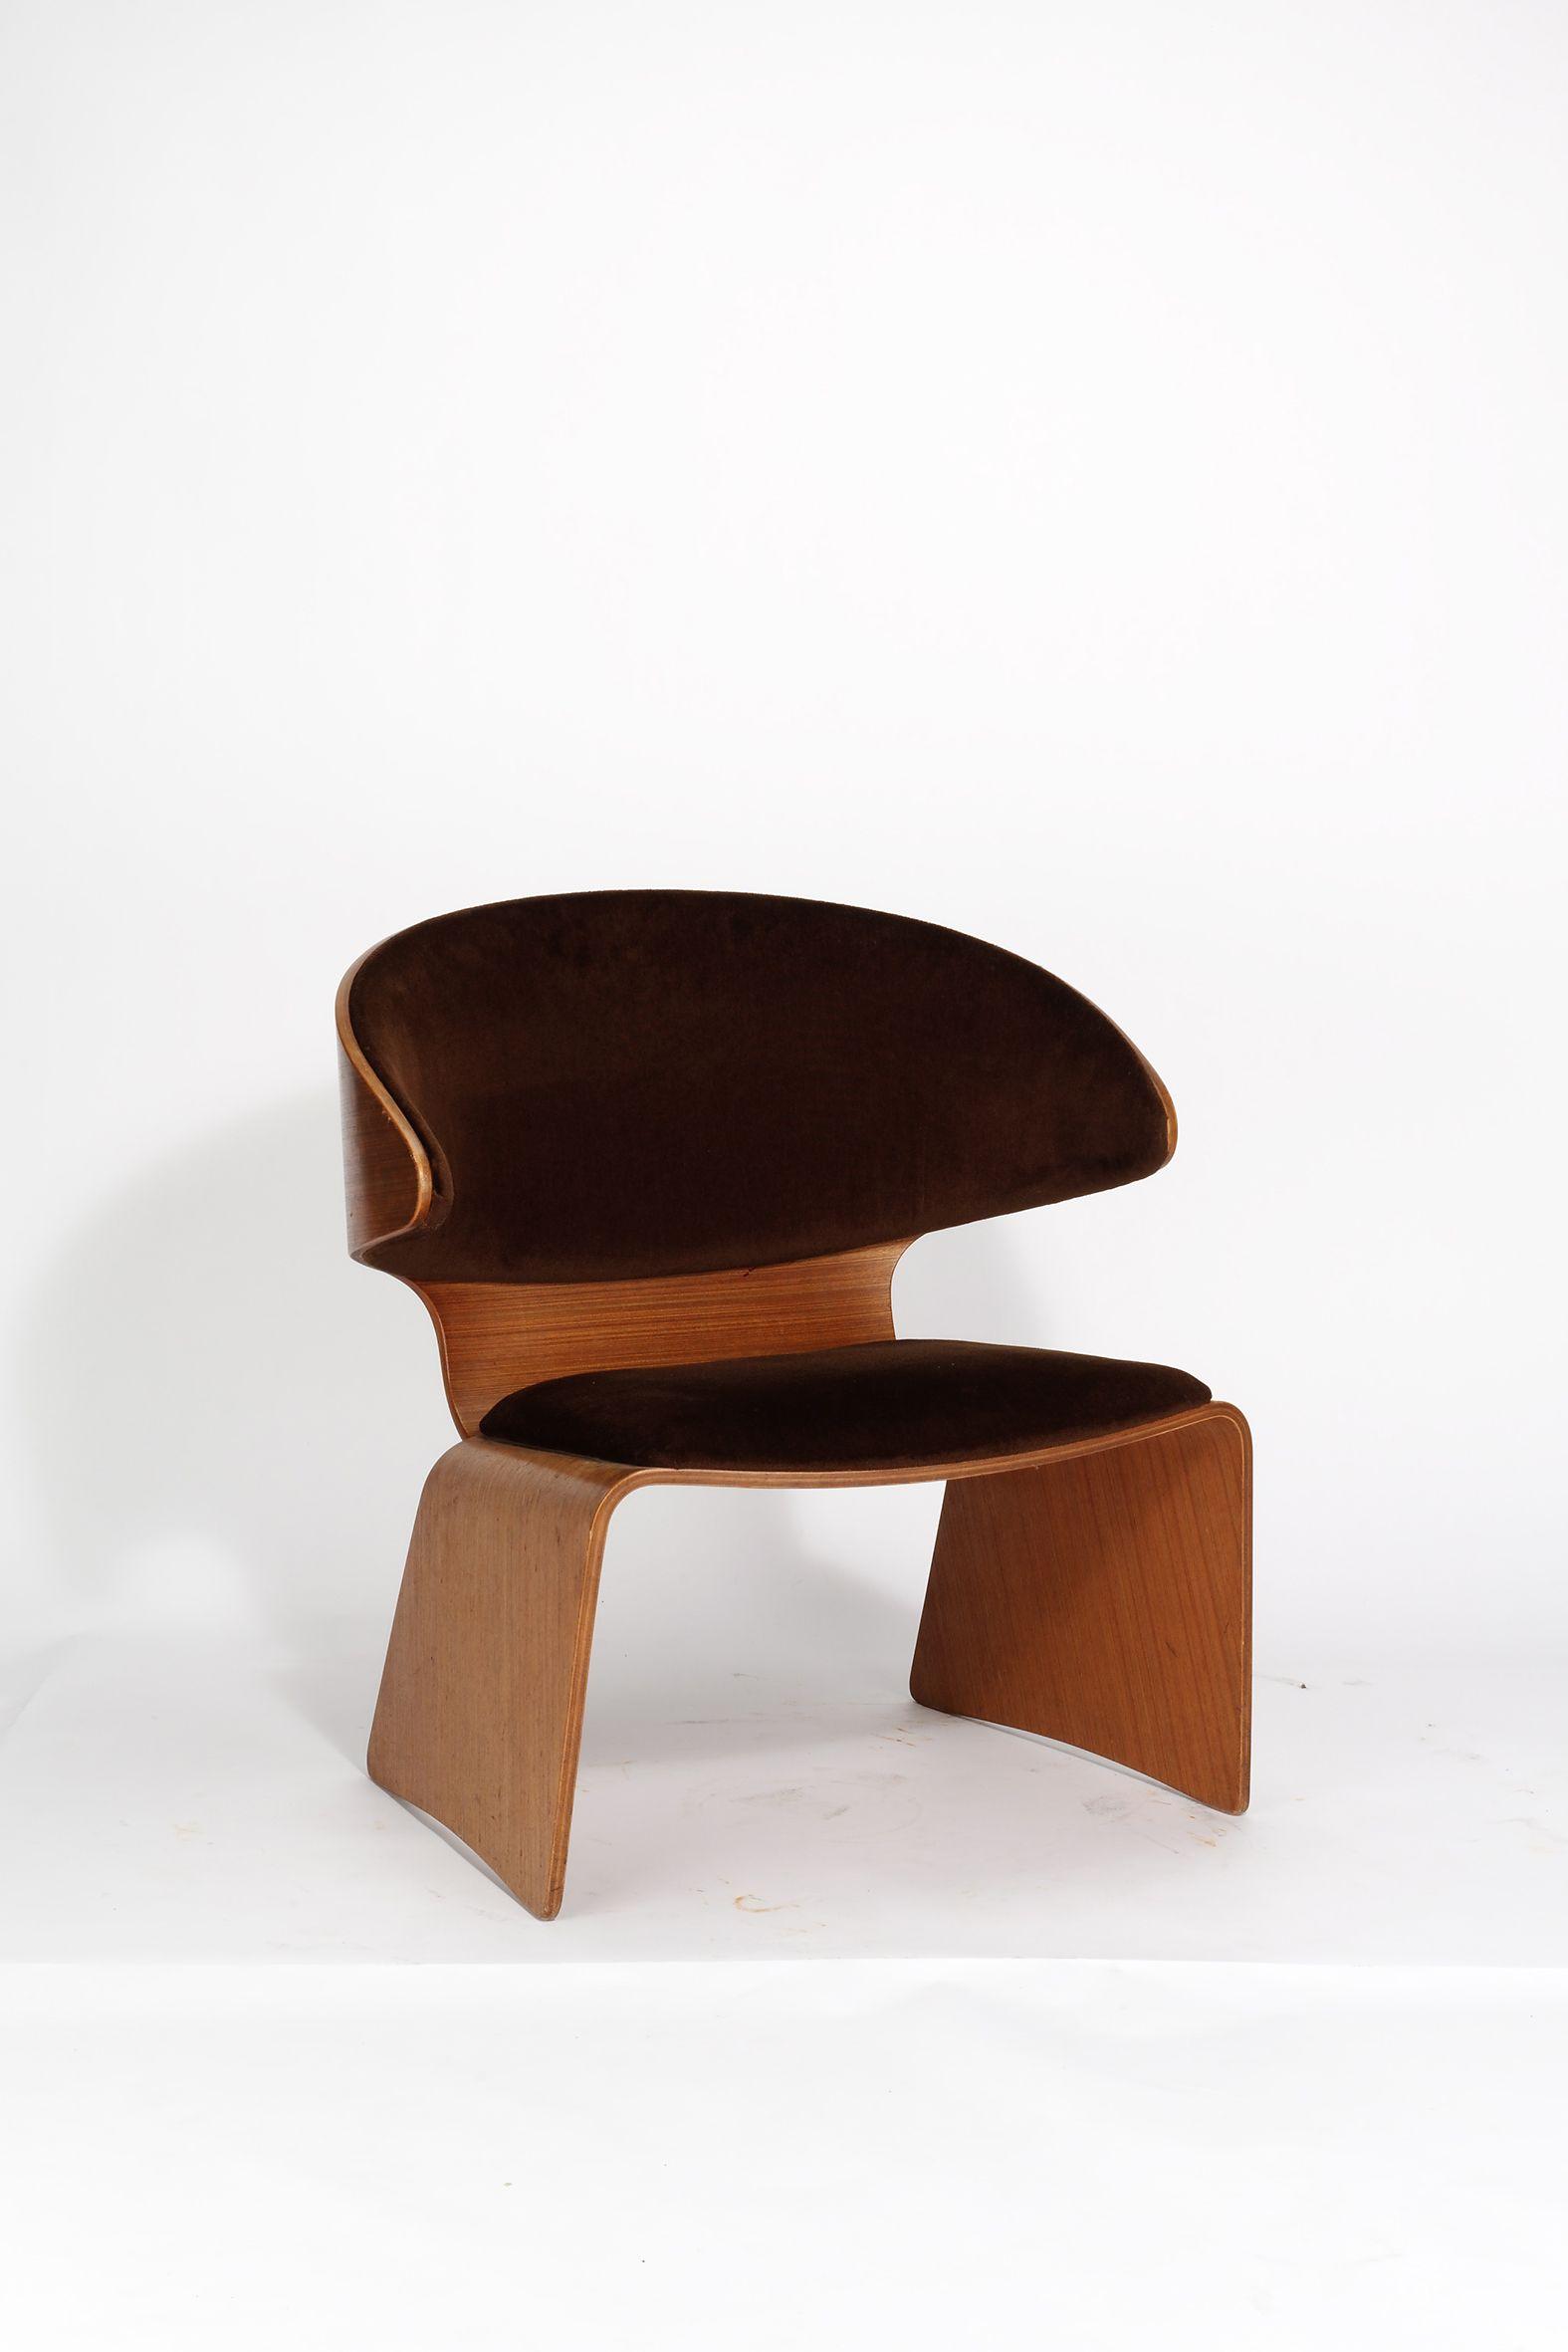 Hans Olsen, bikini lounge chair, 1963 | Vintage möbel